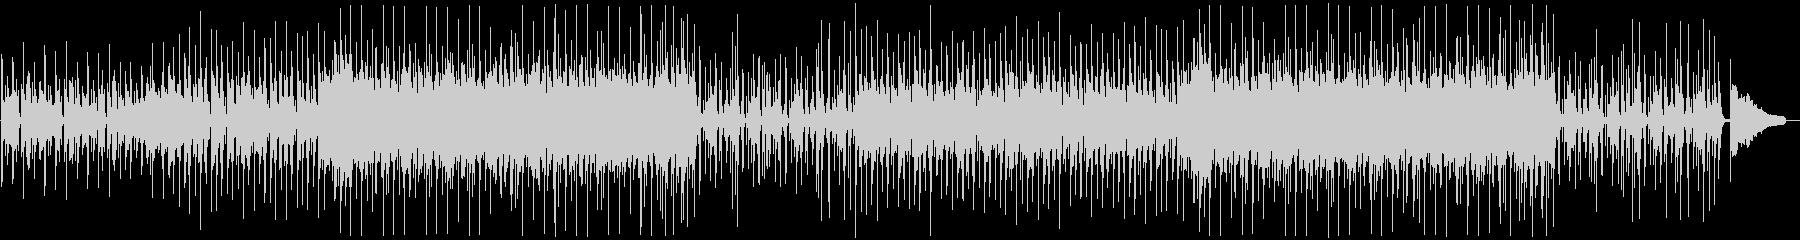 CM用8A、楽しい口笛&ウクレレ・ロックの未再生の波形